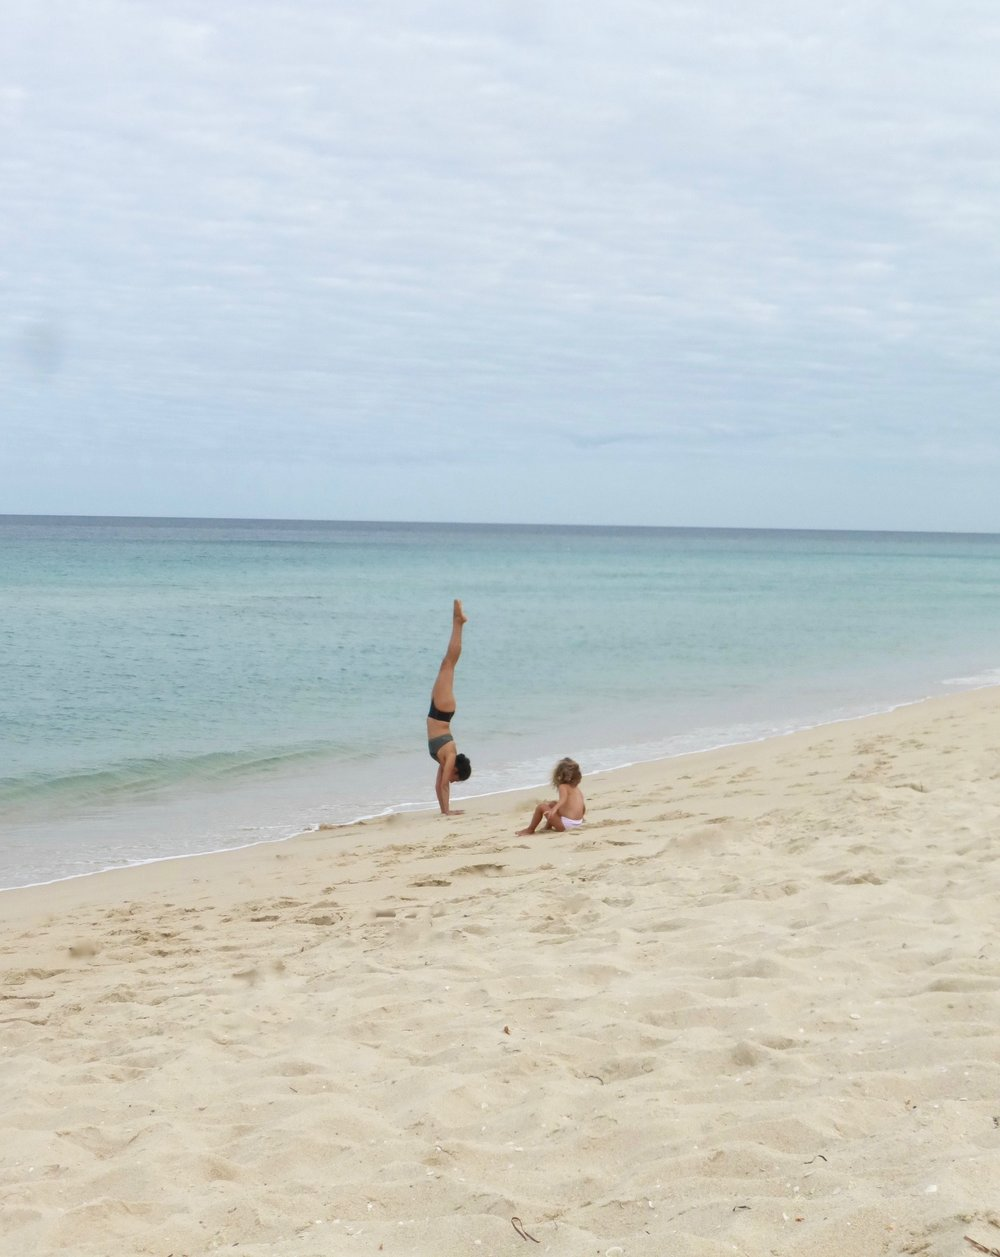 beach morning yoga handstand WA .jpg